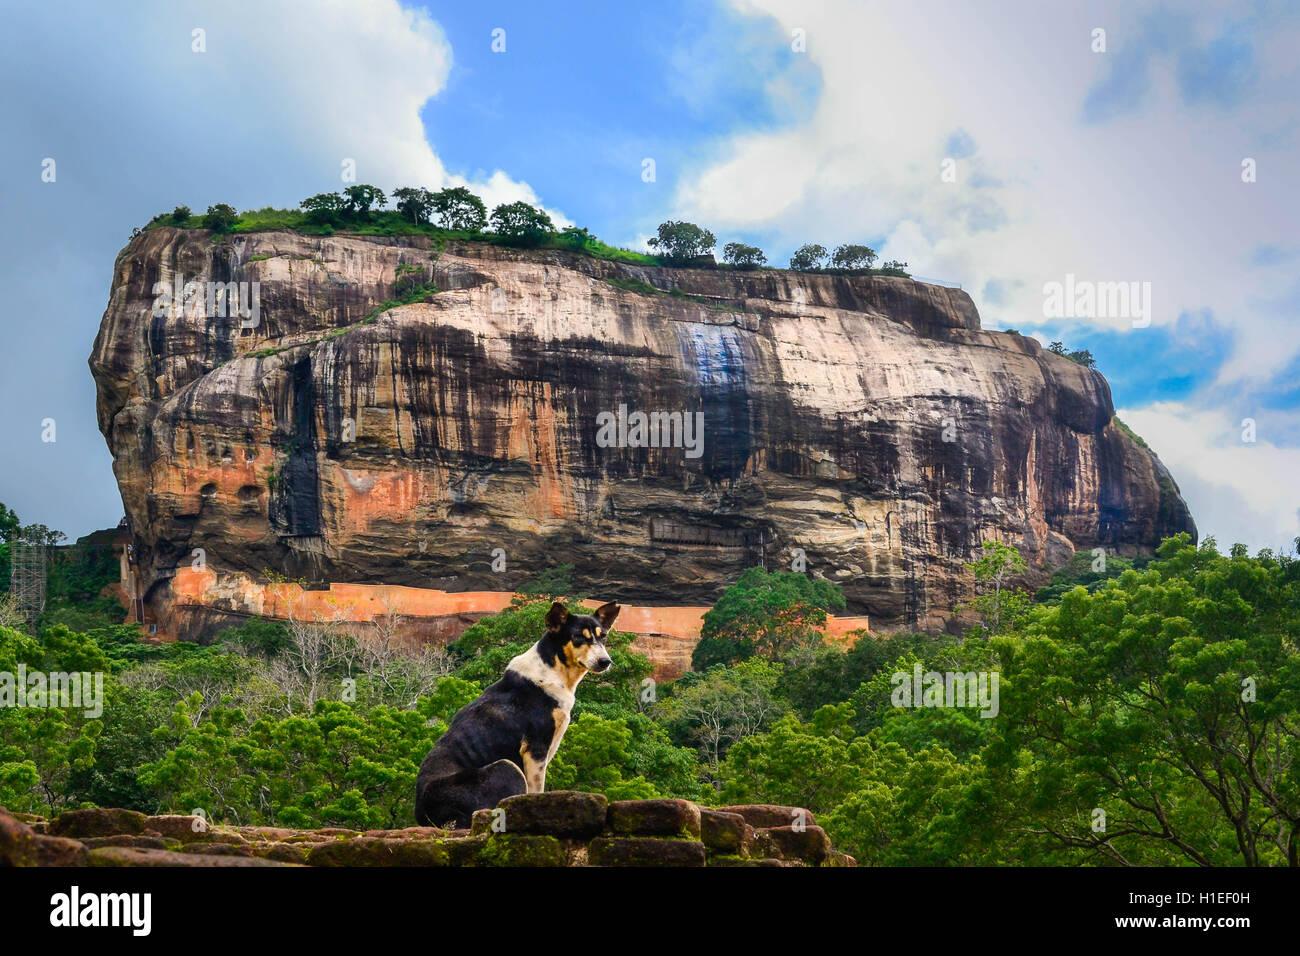 Sigiriya Rock Fortress, UNESCO World Heritage Site, seen from Pidurangala Rock, Sri Lanka, Asia - Stock Image